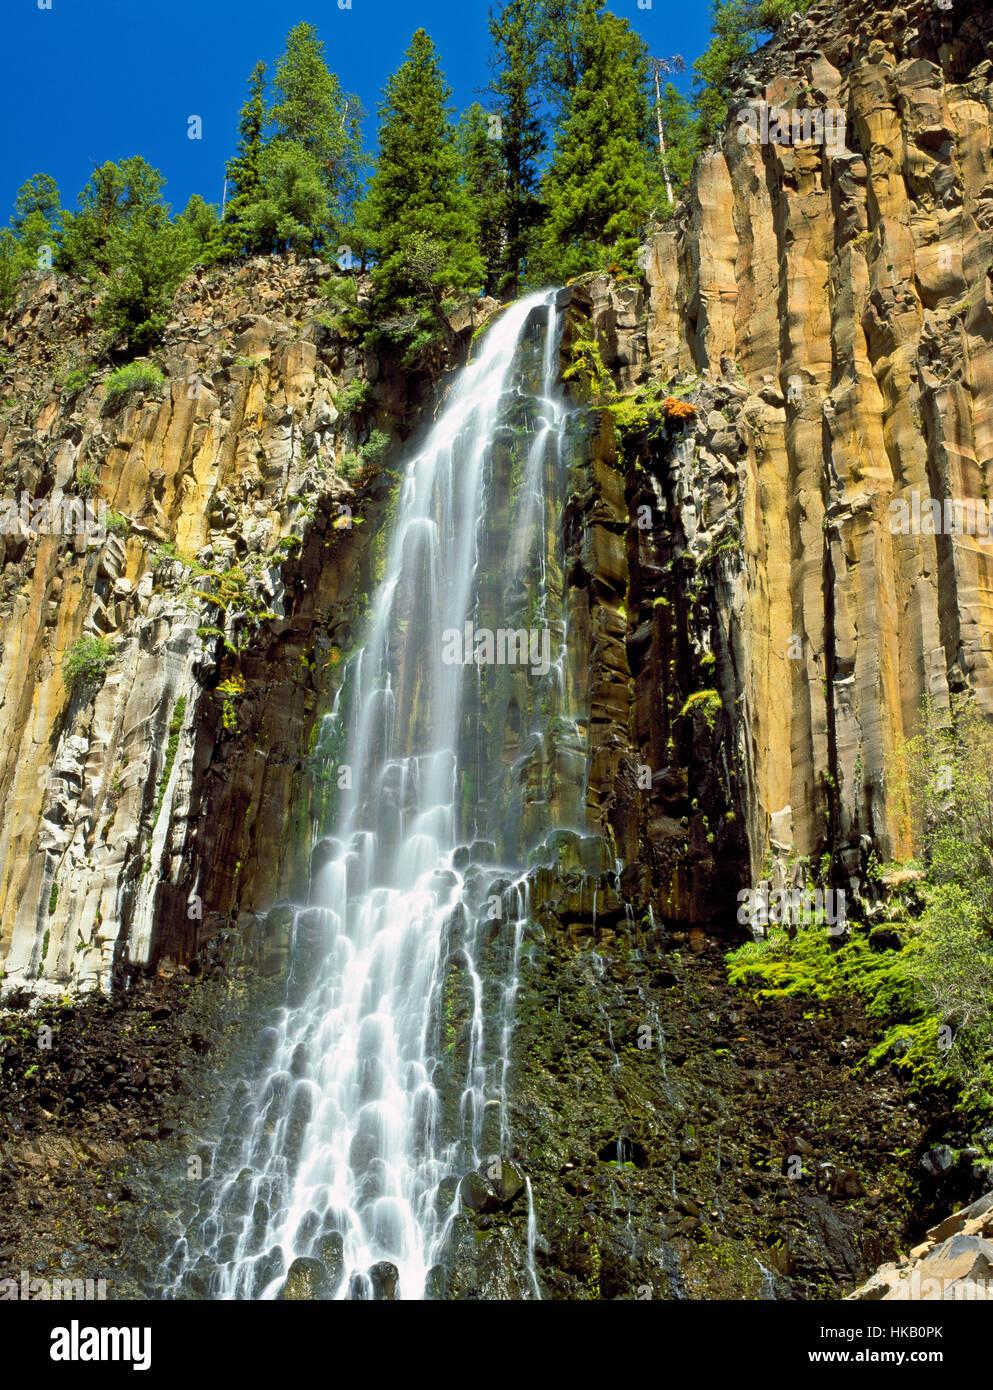 palisade falls spilling over columnar basalt in the east fork hyalite creek basin near bozeman, montana - Stock Image